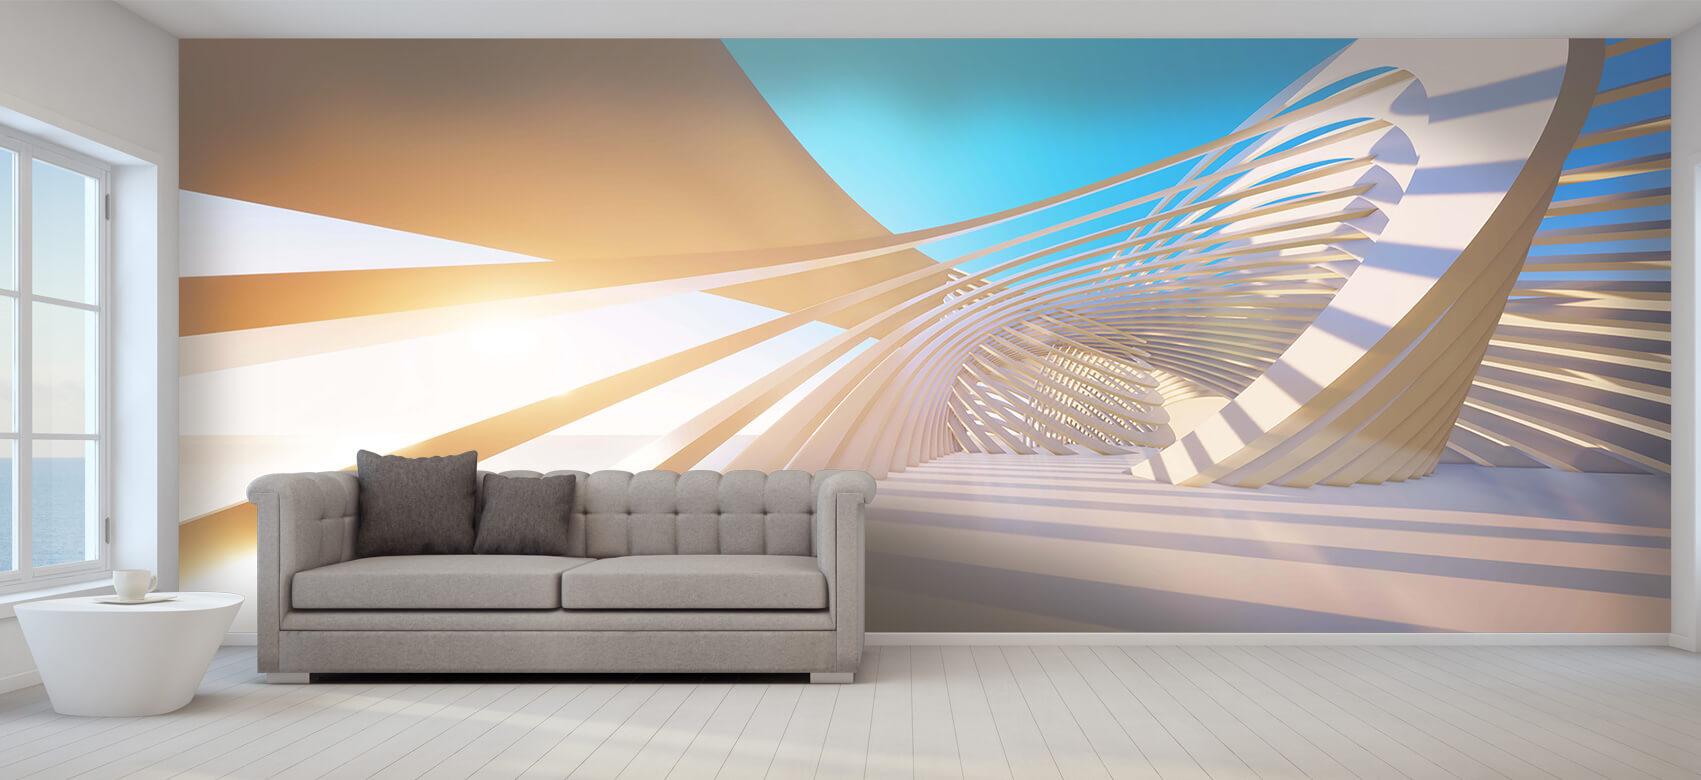 3D Anneaux abstraits 8